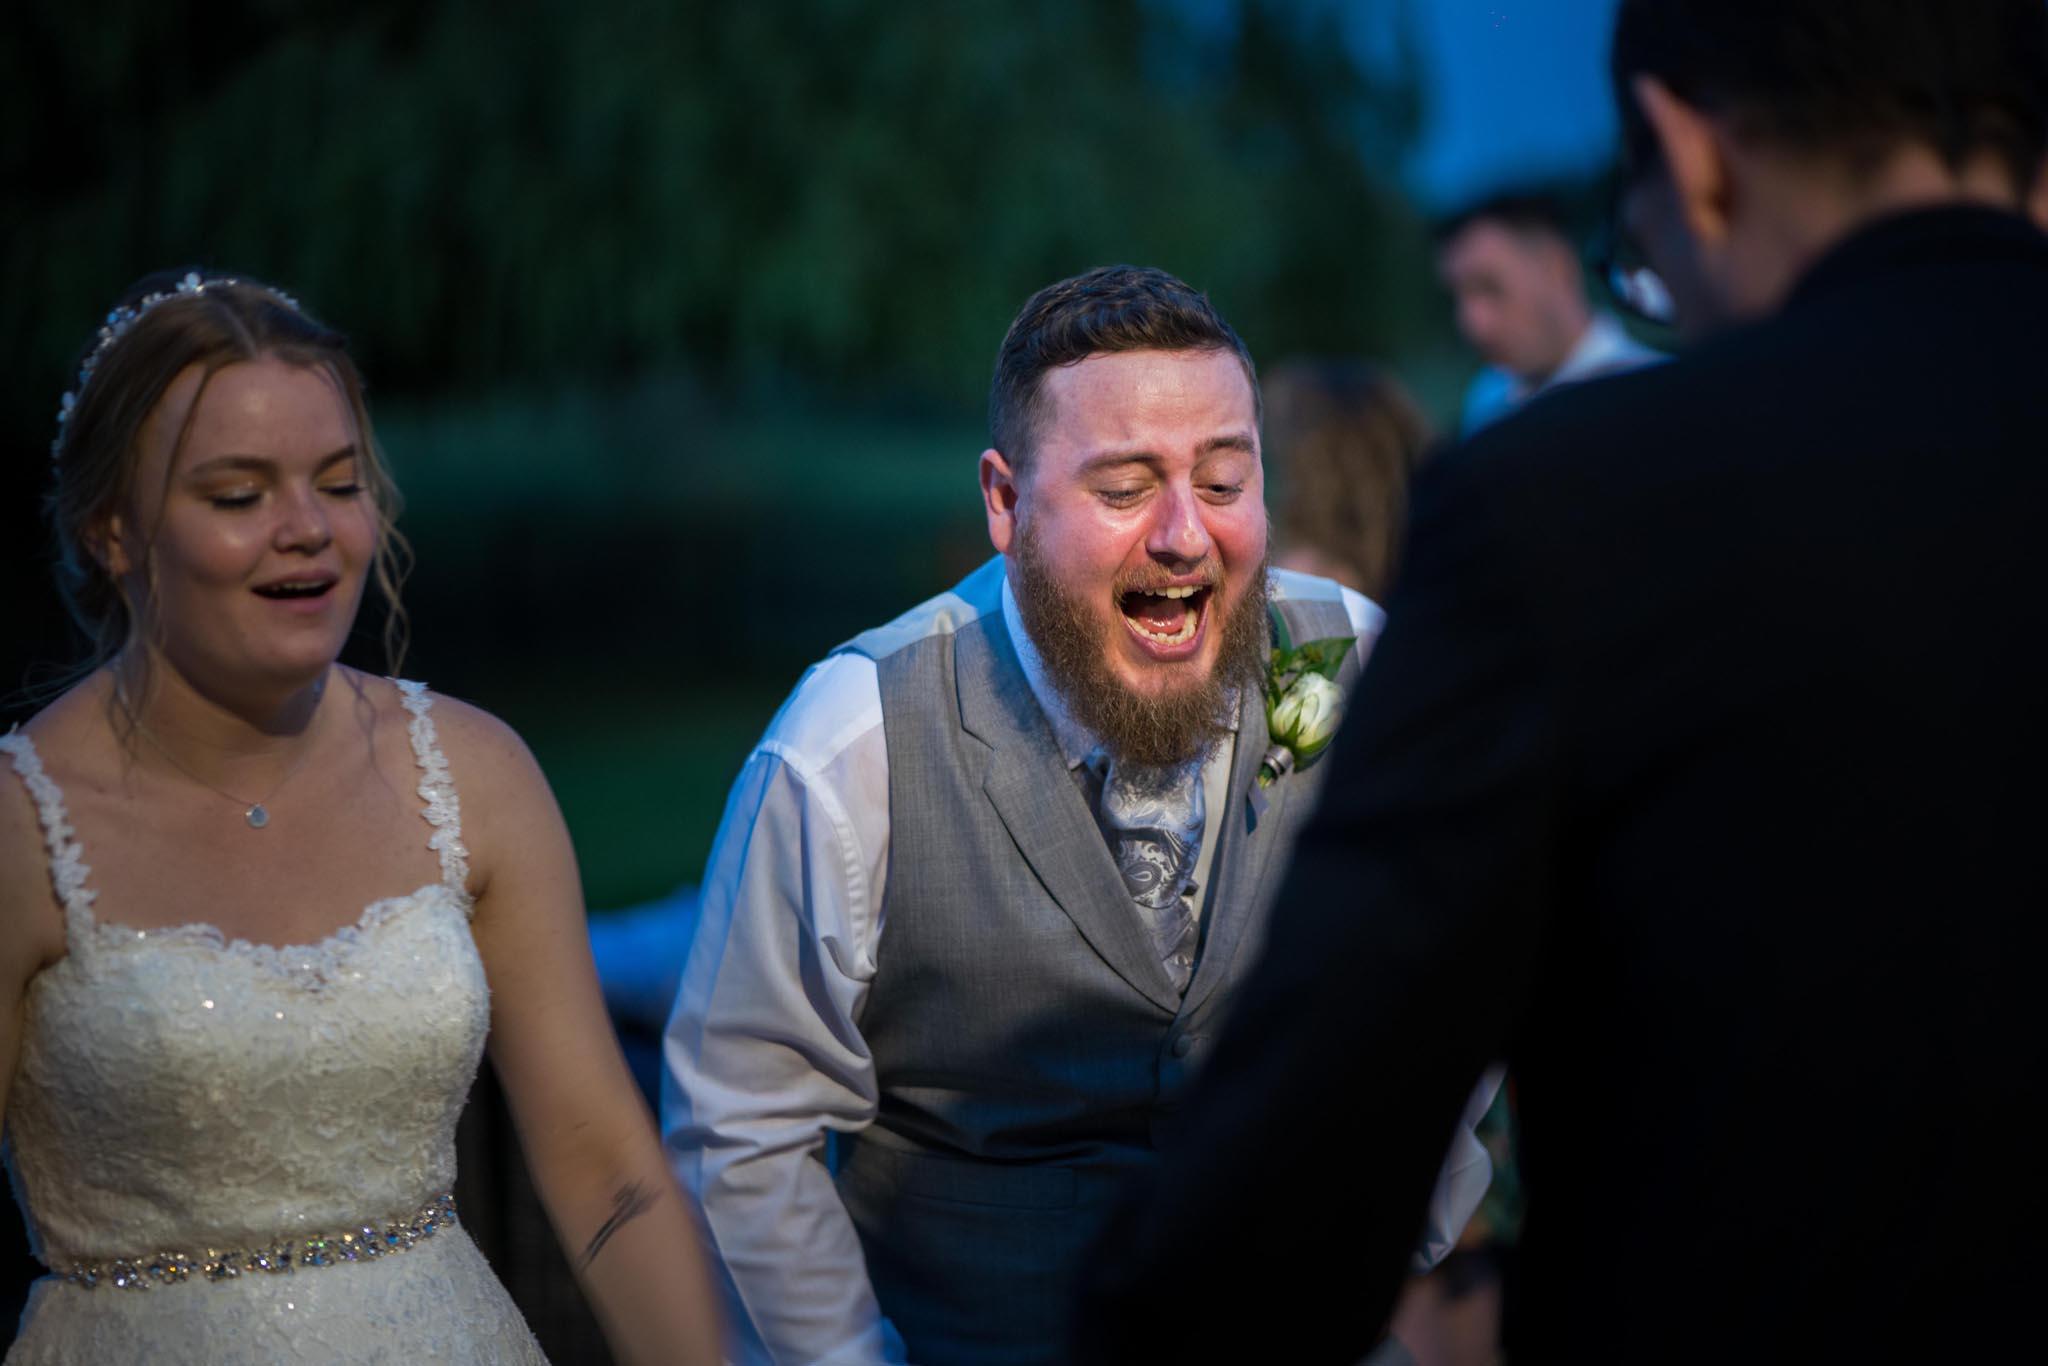 988-Night-Reception-Luke-Yasmin-The-Rayleigh-Club-Wedding-Photography.jpg